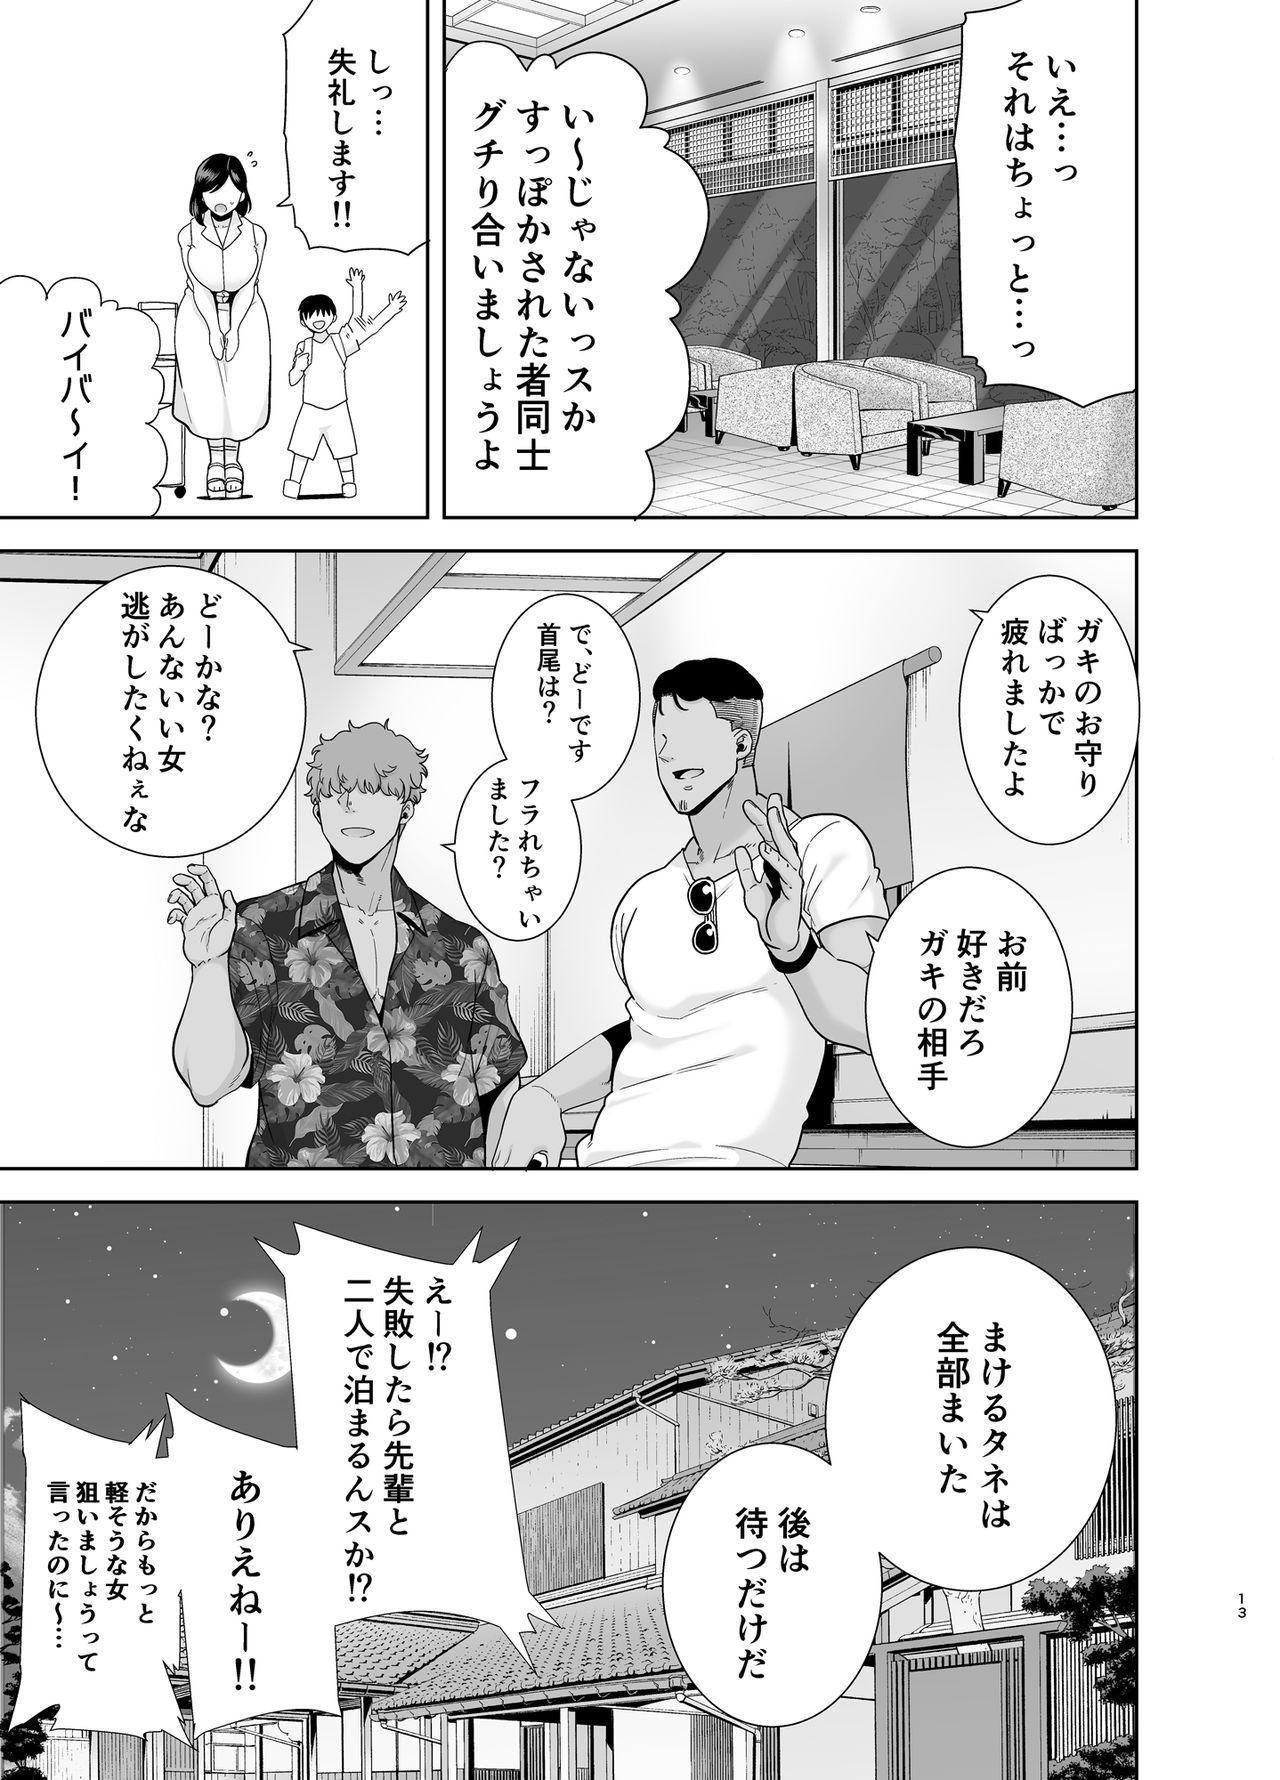 Natsuzuma 11